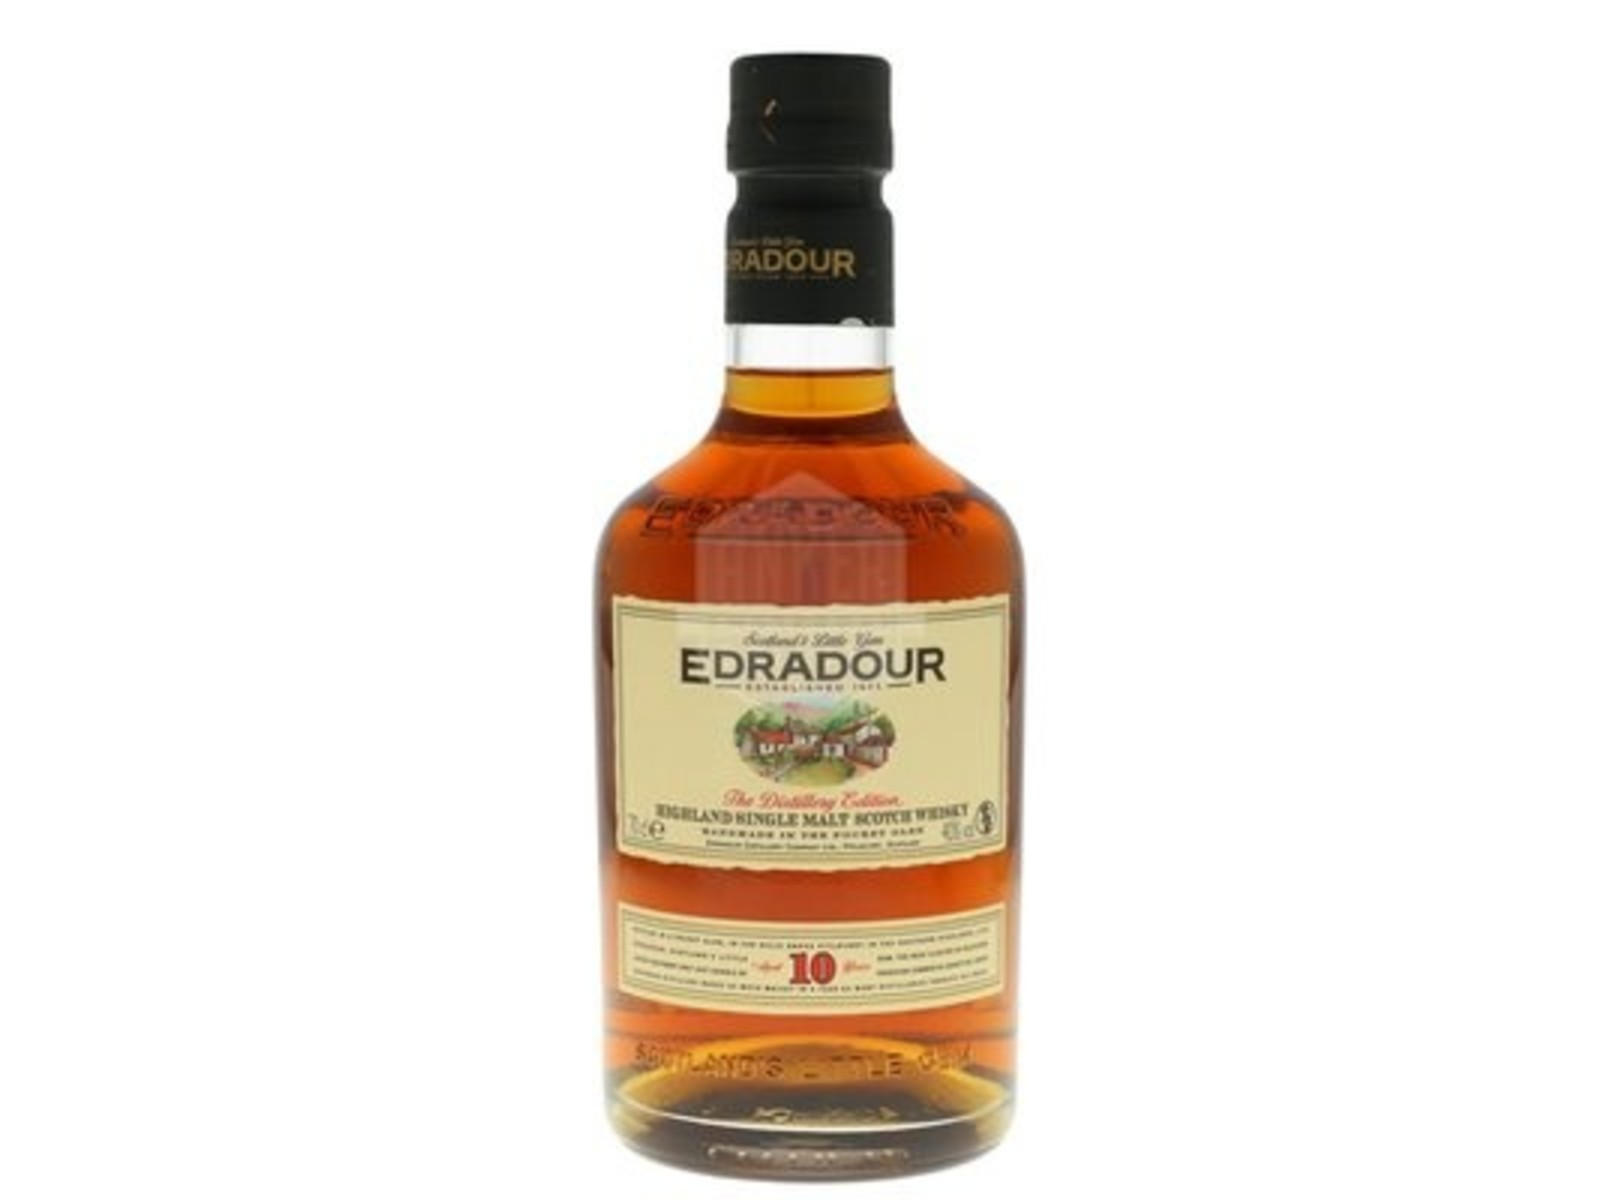 Edradour Edradour / 10 years / whisky / 0,7L